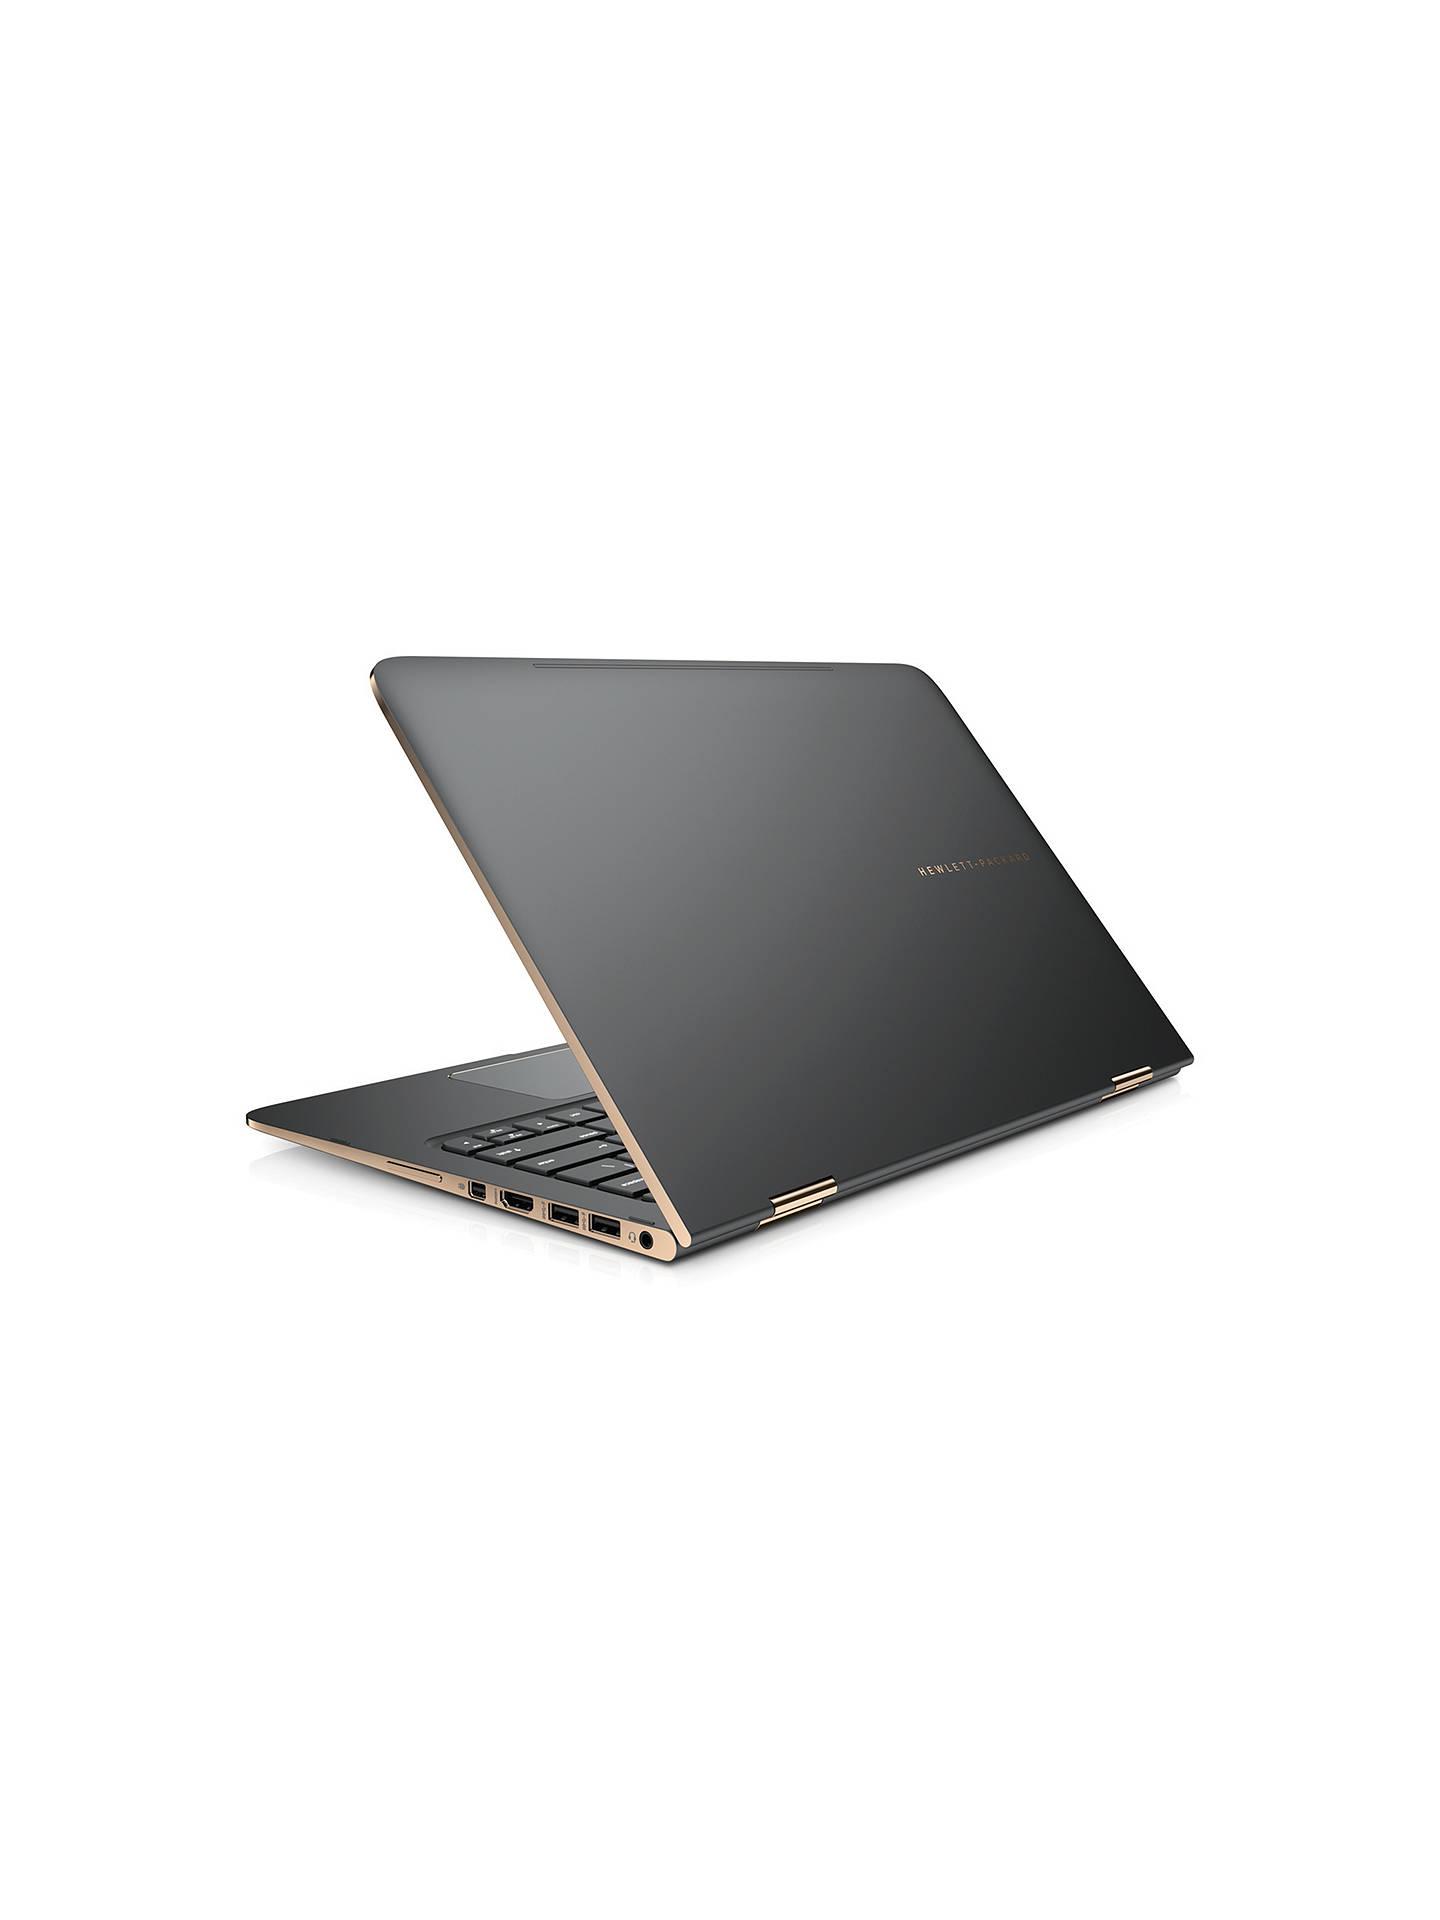 HP Spectre x360 13-4129na Convertible Laptop, Intel Core i7